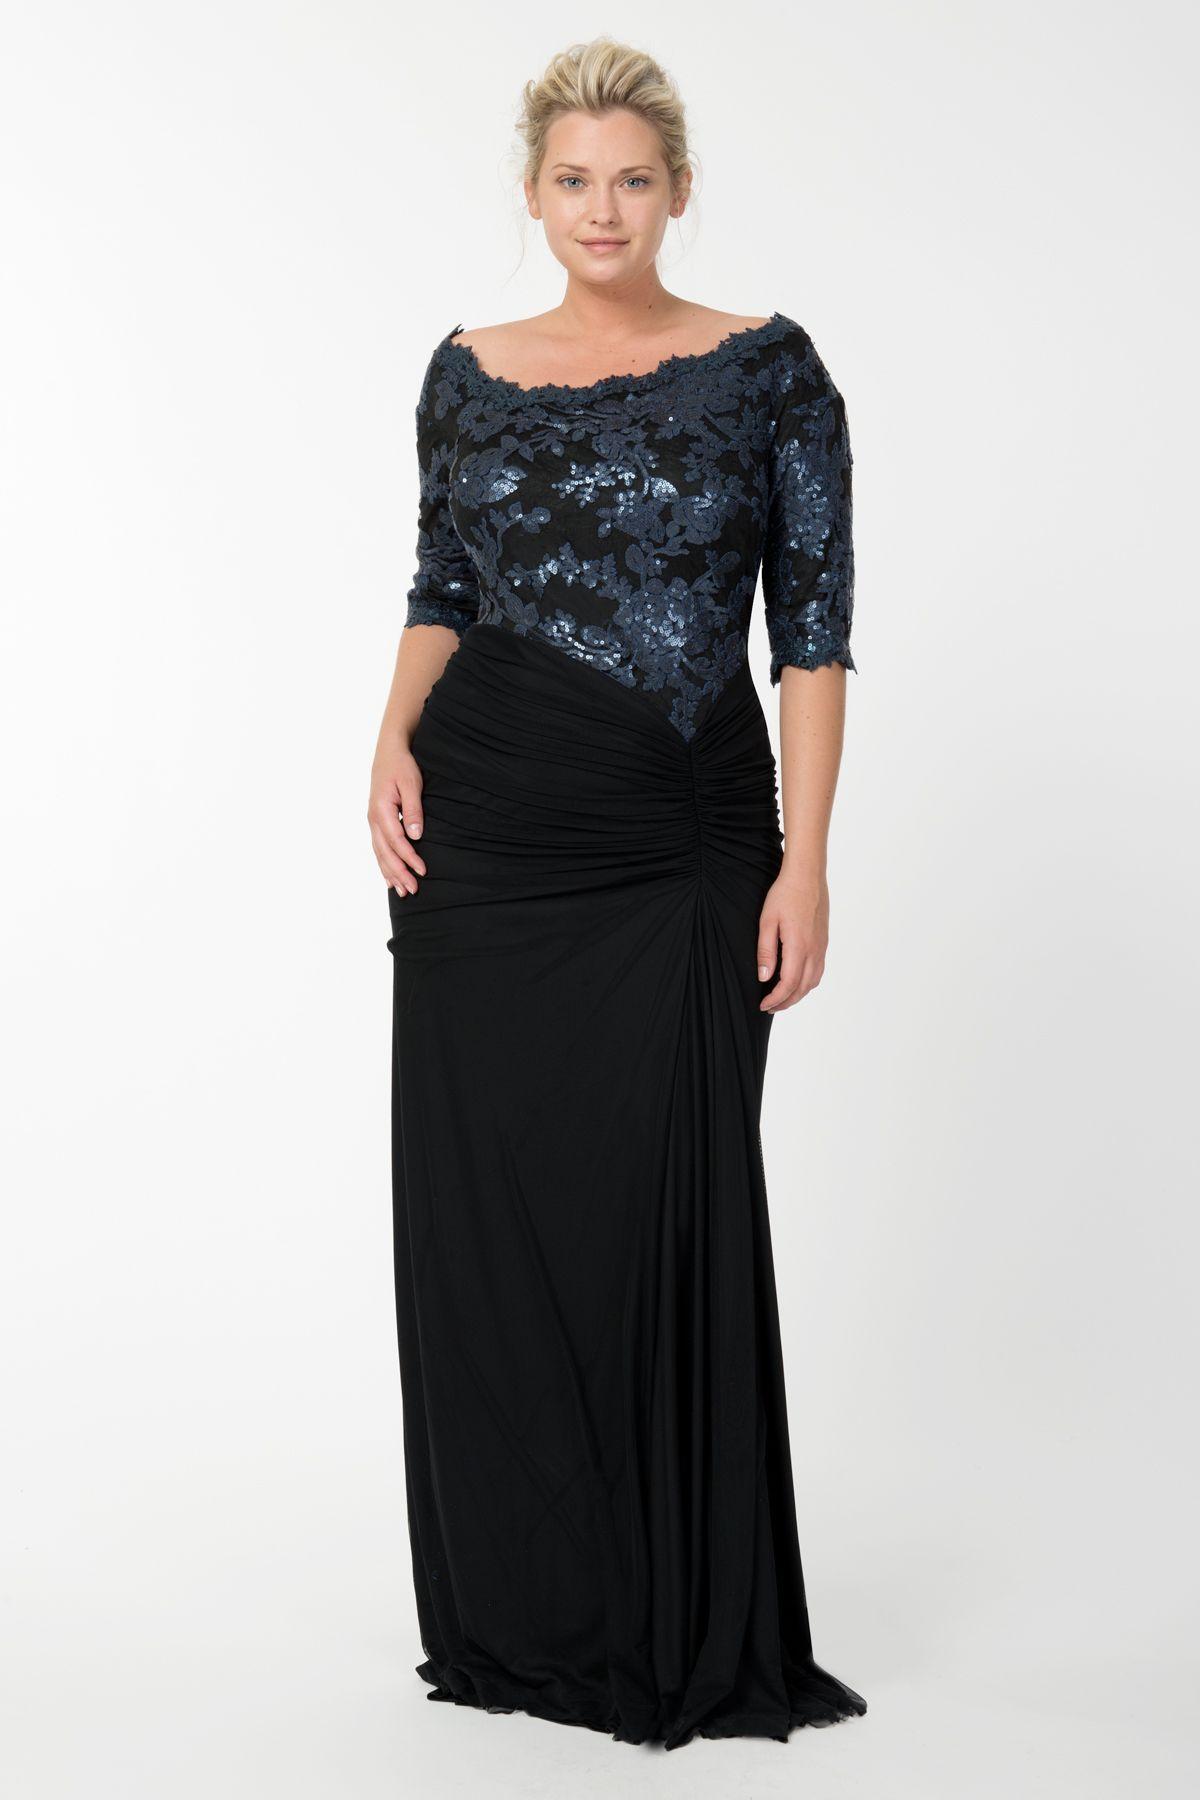 Plus size long dresses for wedding  Sequin Lace Asymmetric Gown in Prussian Blue  Black  Tadashi Shoji